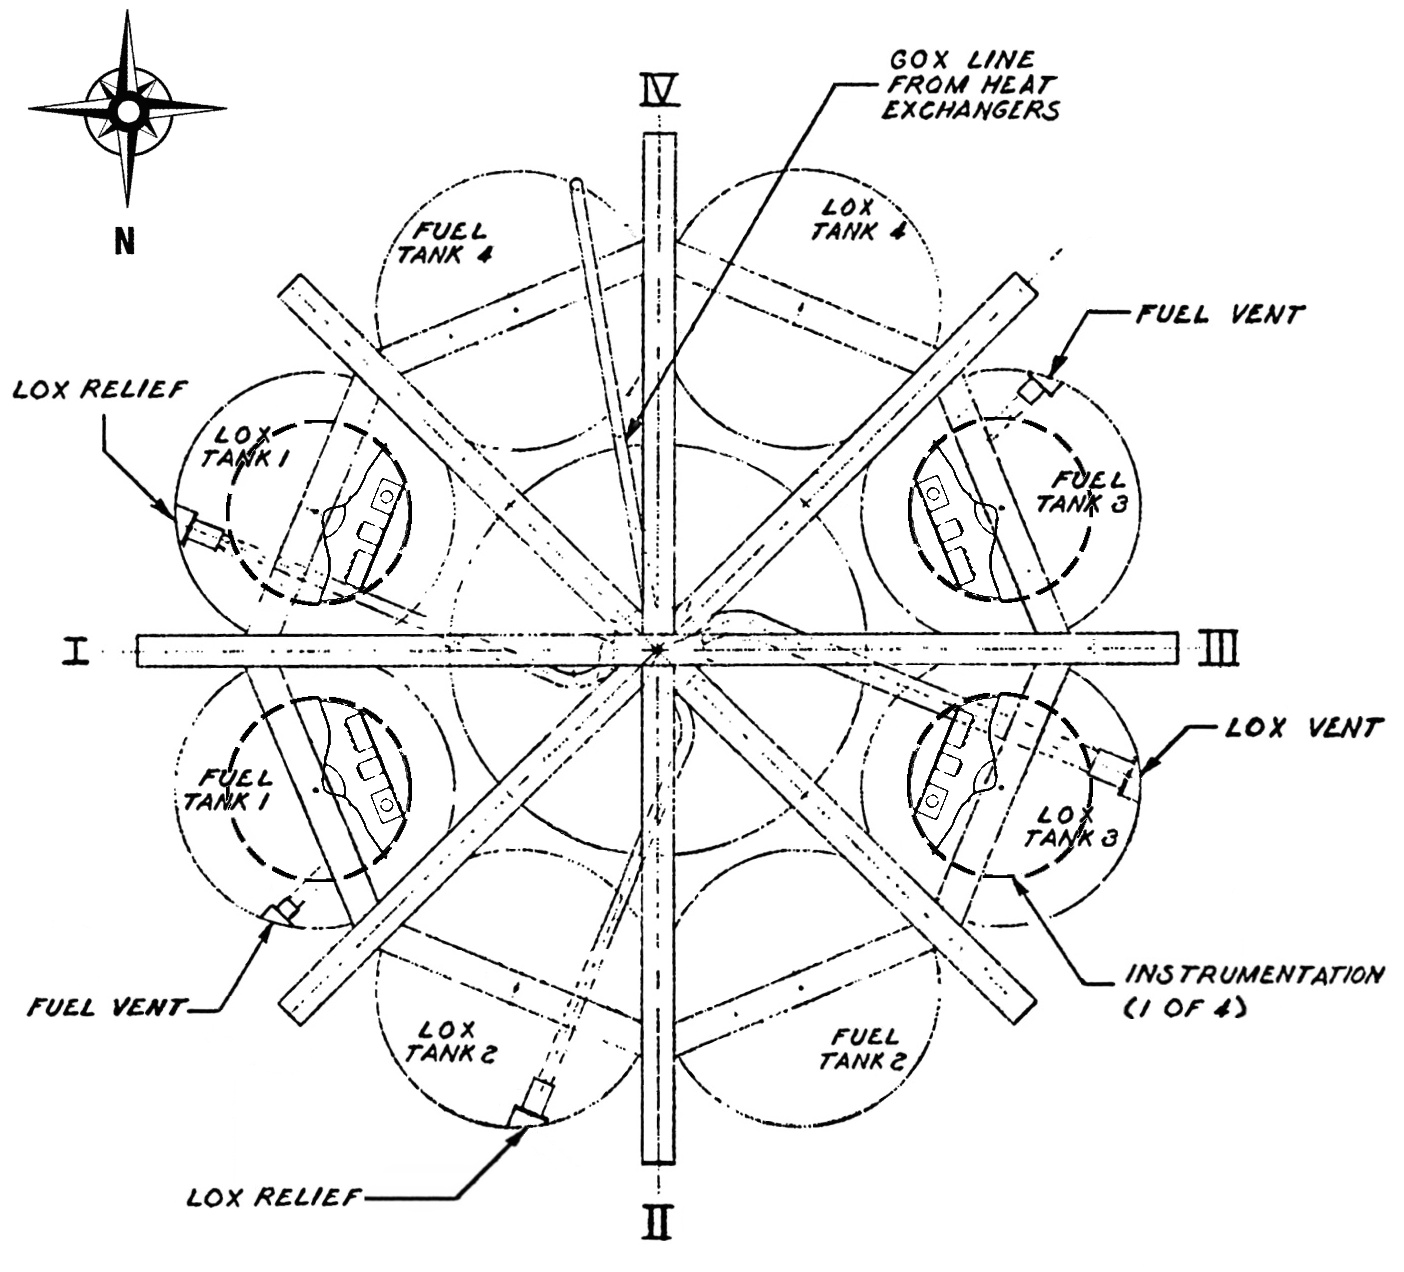 Sa d saturn dynamic test vehicle orientation - Building orientation to optimize sun exposure ...